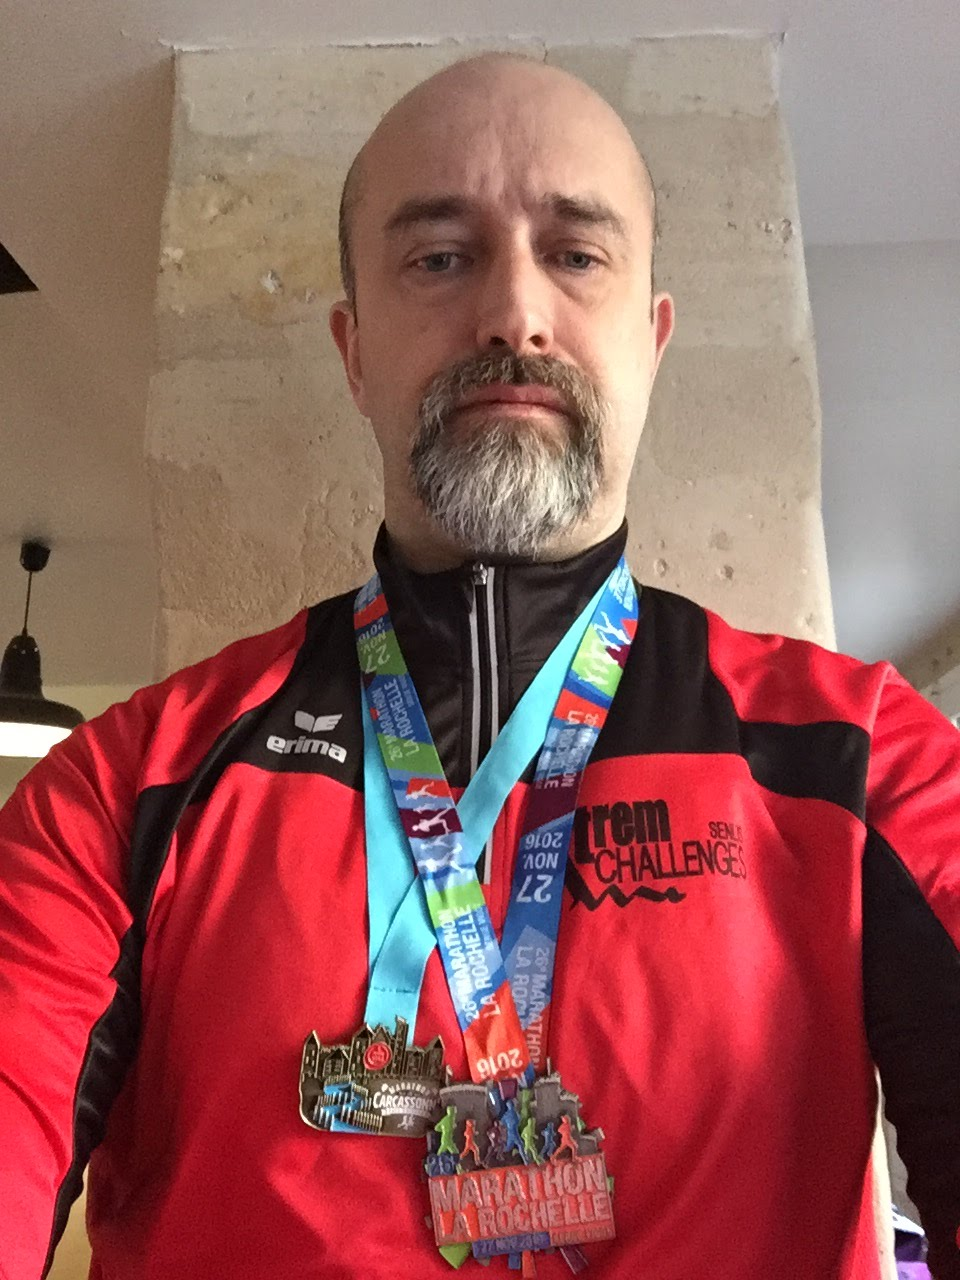 2 Marathons